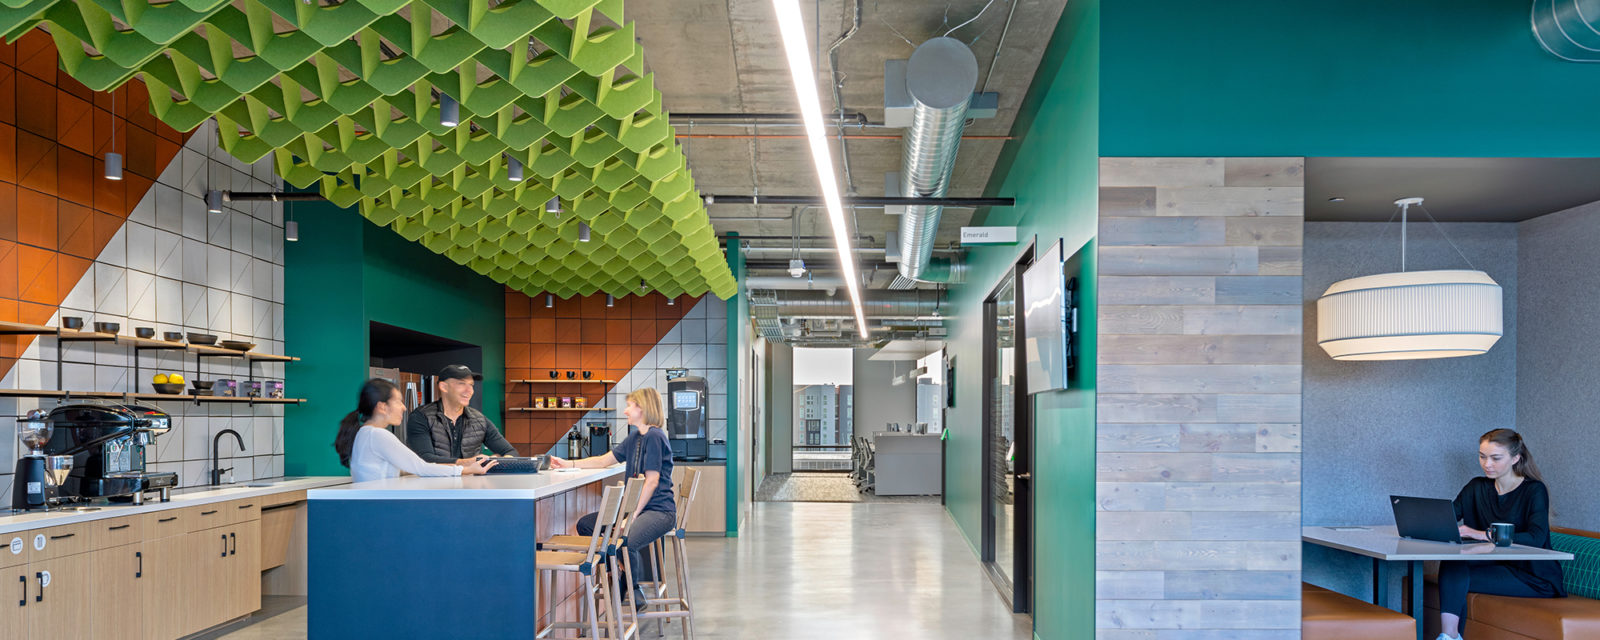 Adobe Hooper  | Design firm: Gensler  |  Photo: Jasper Sanidad  | Product: Turf Custom Ceiling Baffle